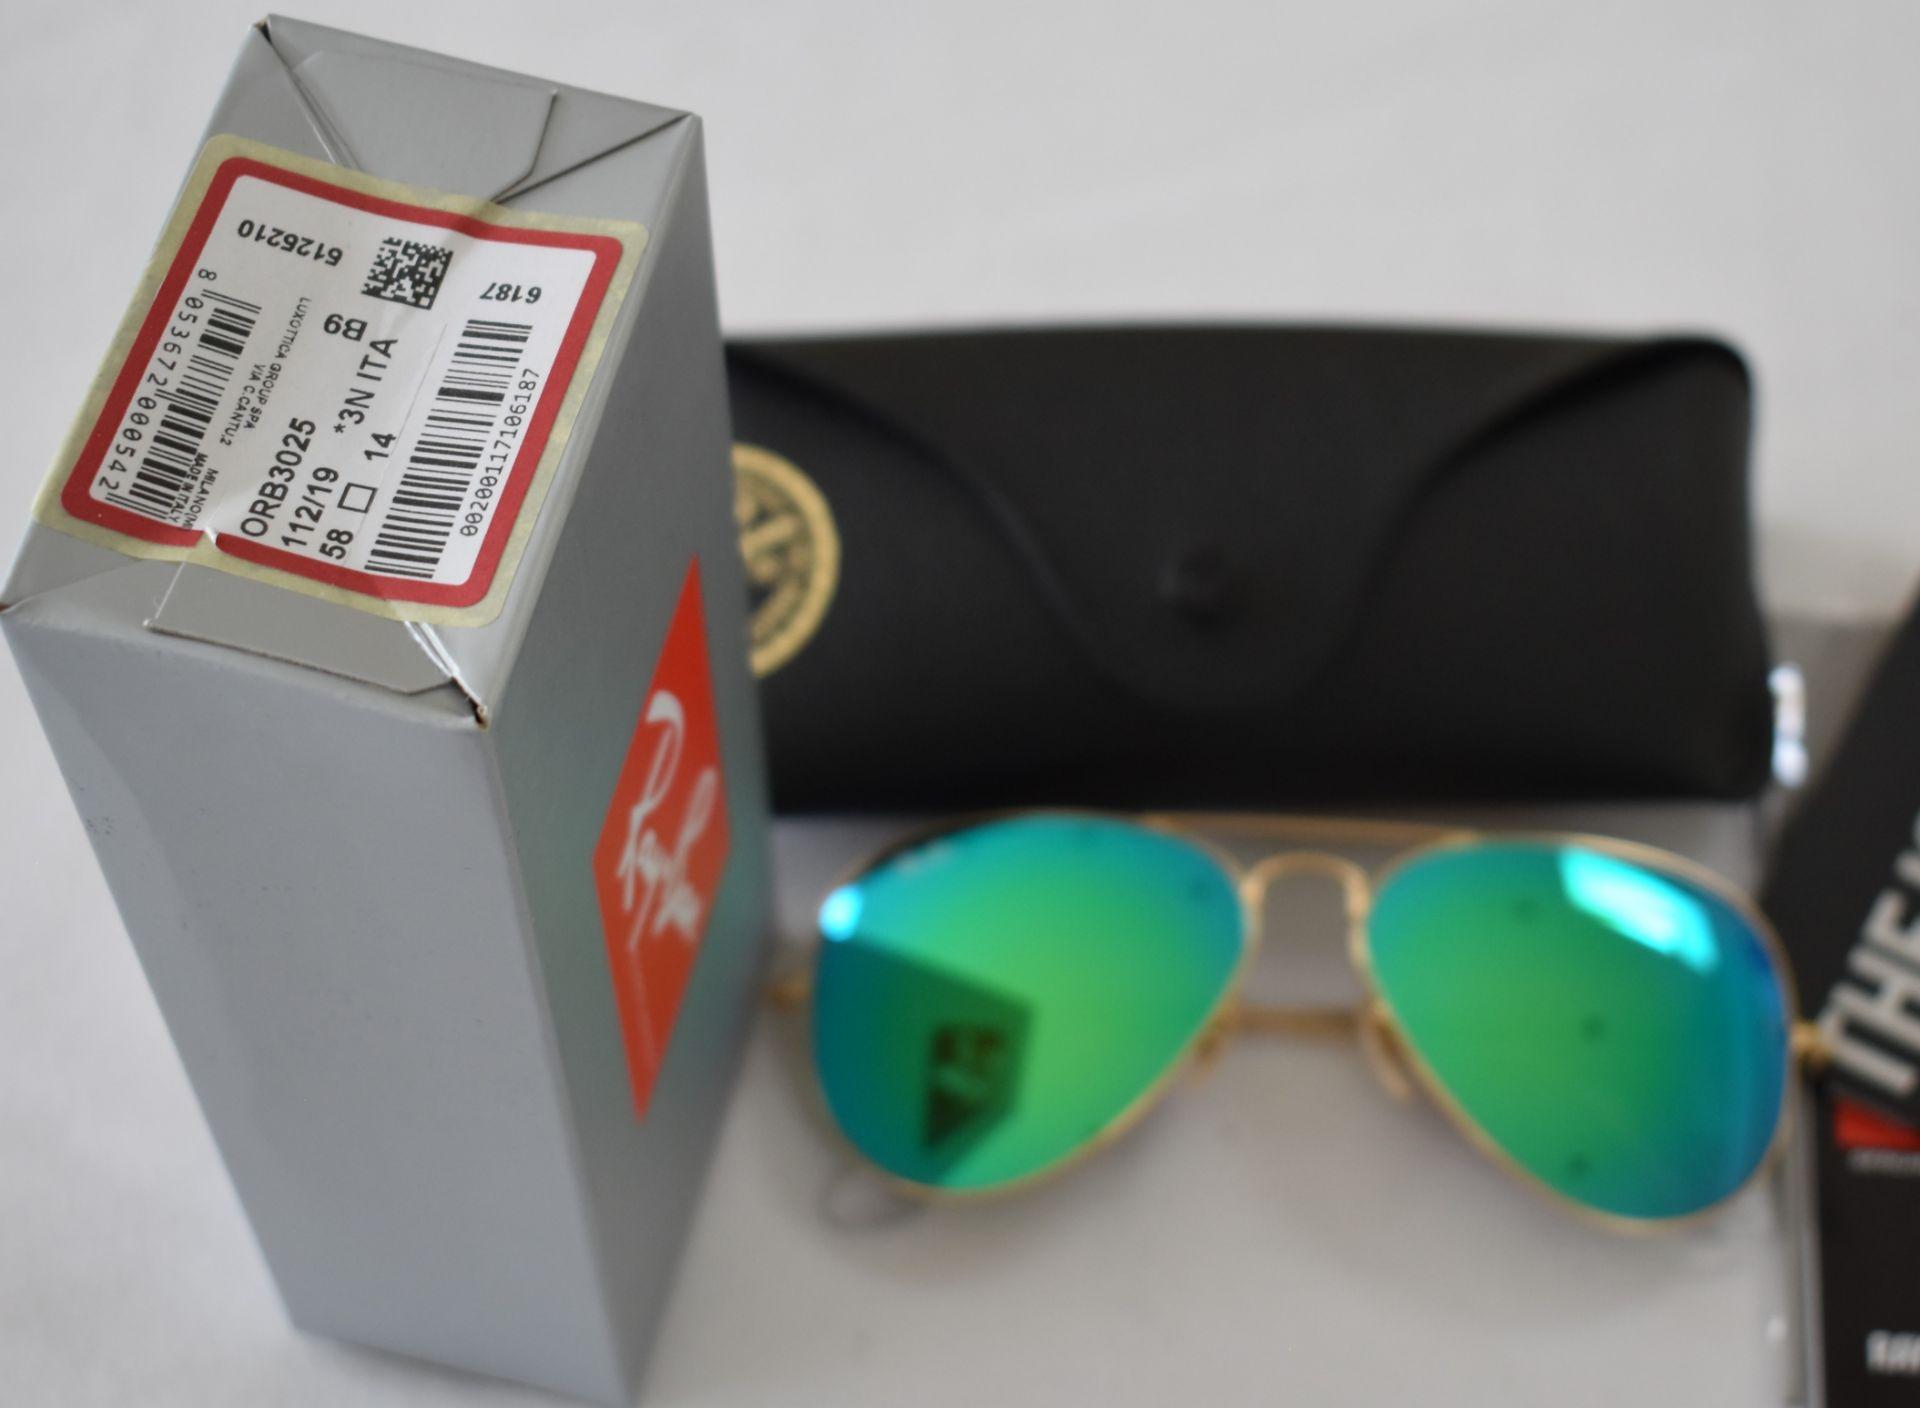 Ray Ban Sunglasses ORB3025 112/19 *3N - Image 2 of 2